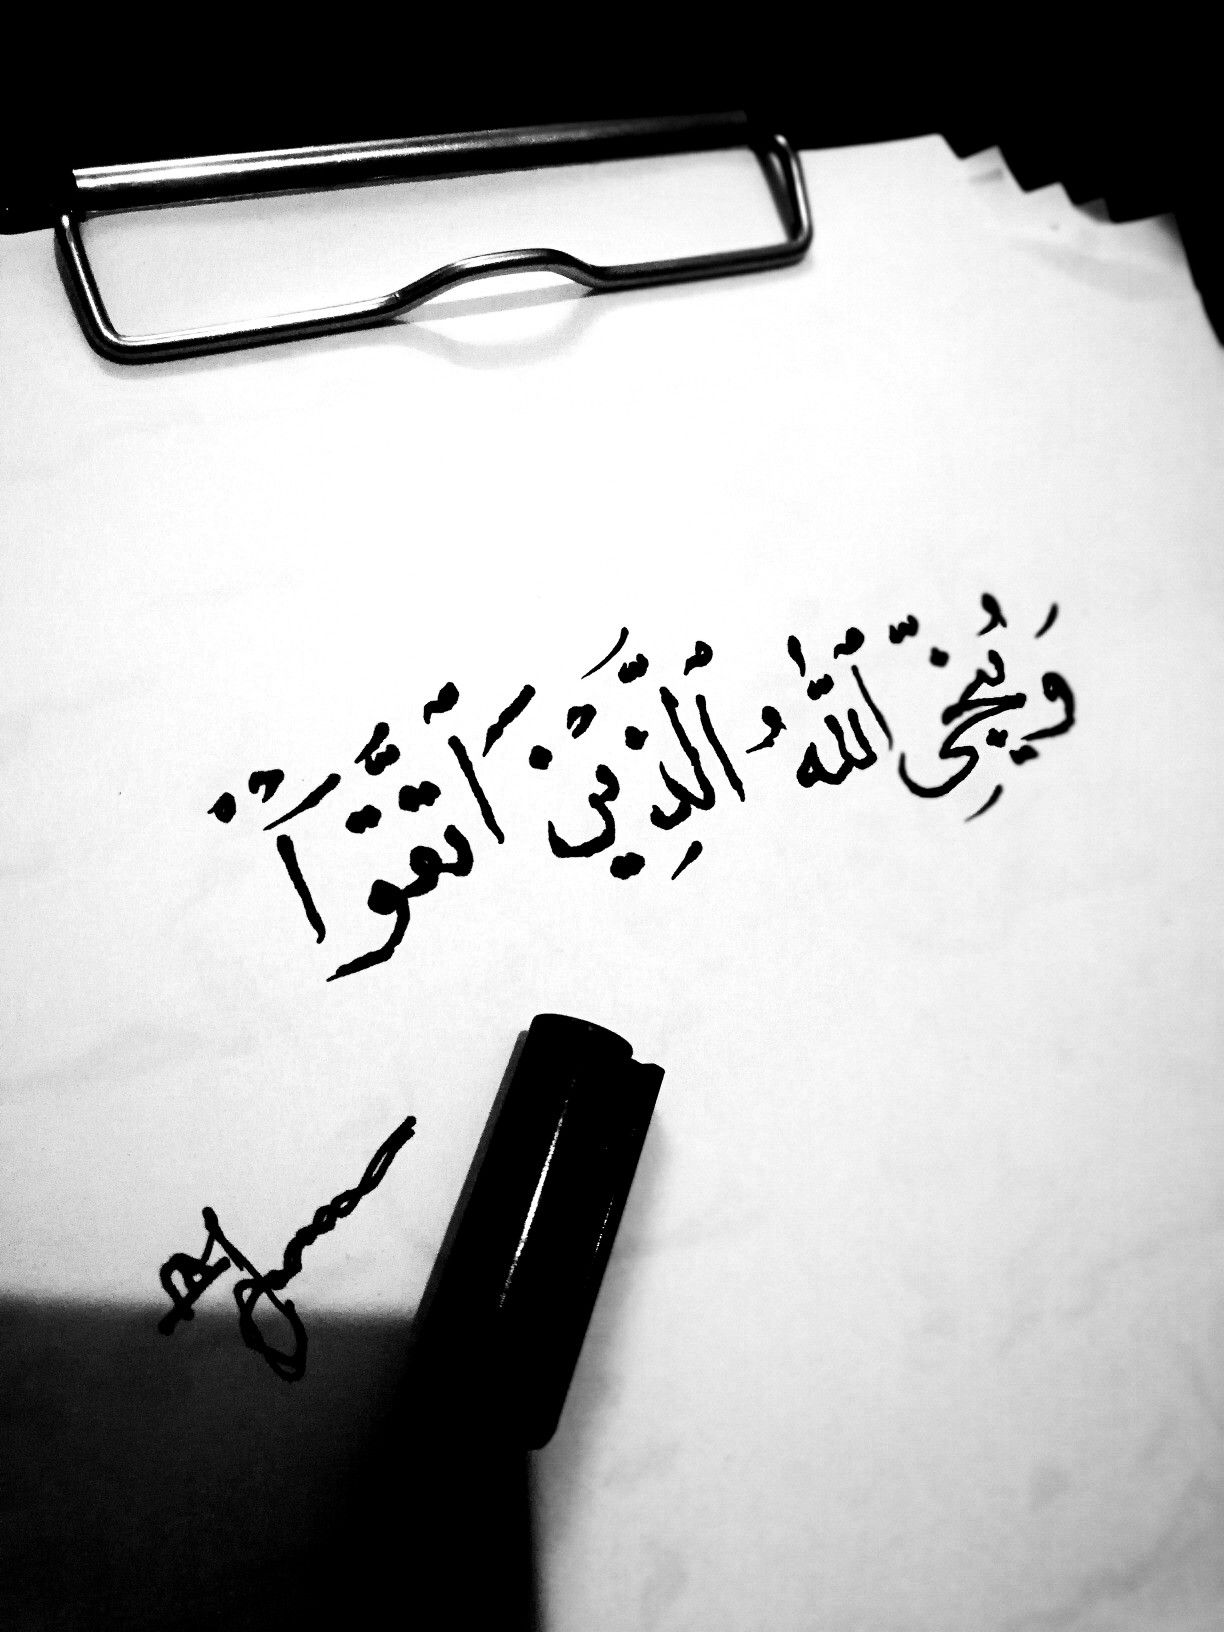 وينجي الله الذين اتقوا Arabic Calligraphy Handwriting Calligraphy